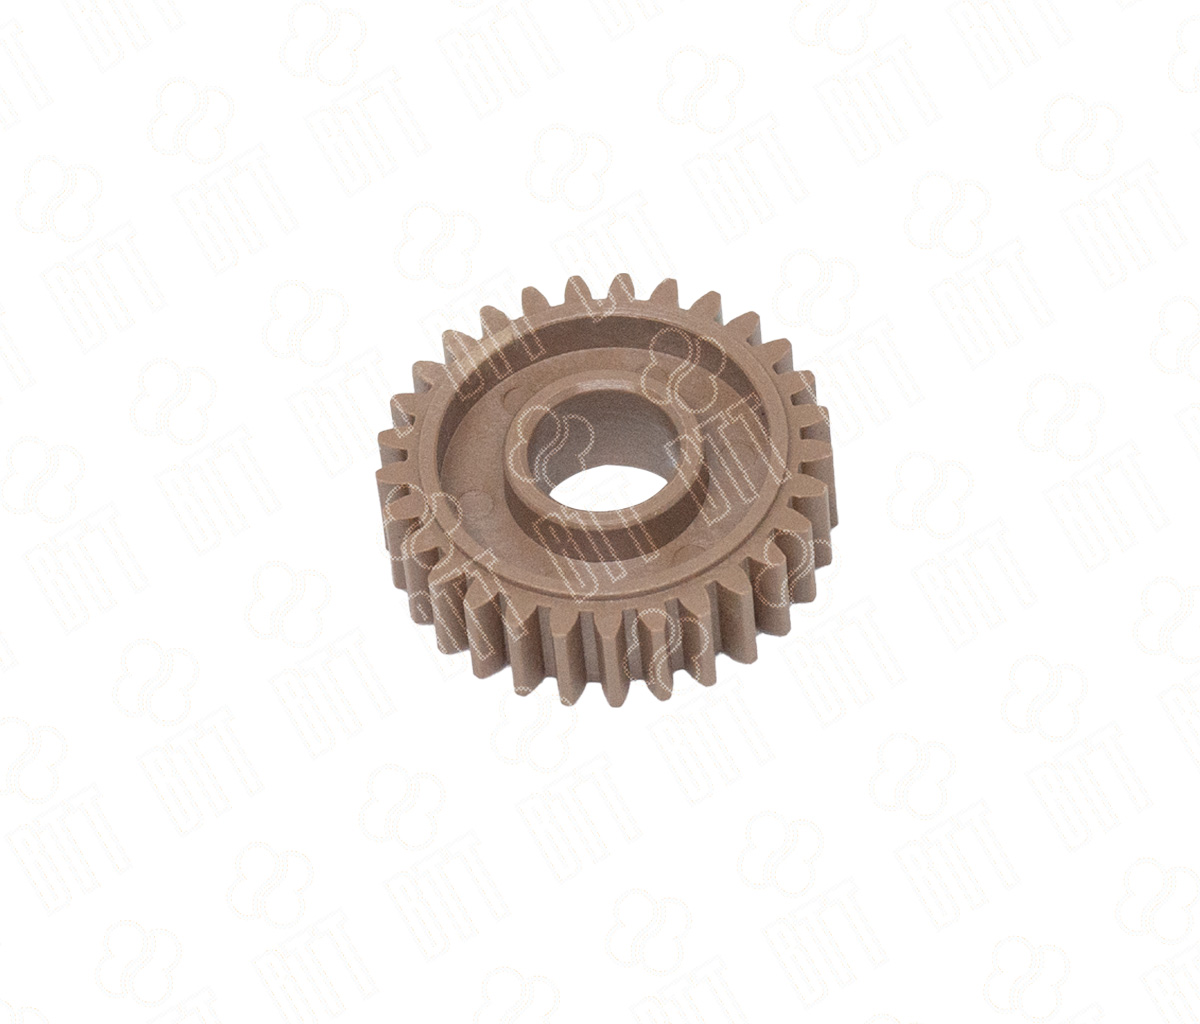 Шестерня А Z29 привода тефлона совм. для KyoceraFS-1028/1100/1300D/1128MFP, 302F925080